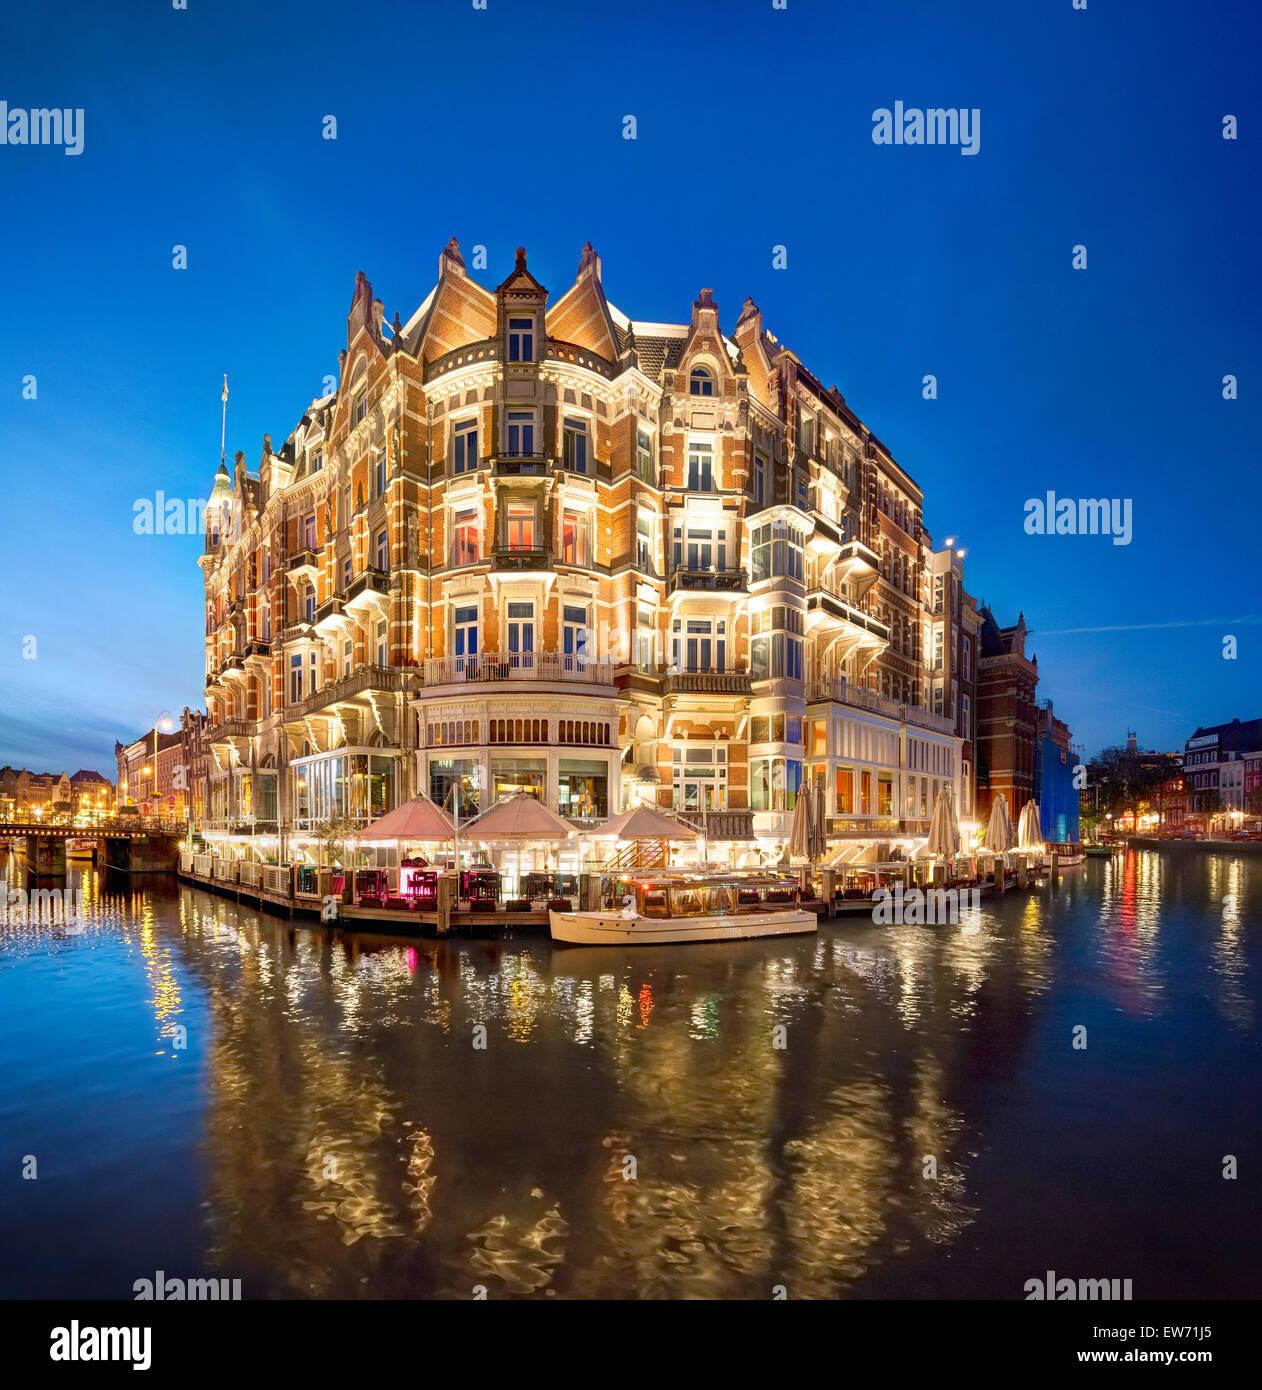 Rokin Hotel Amsterdam